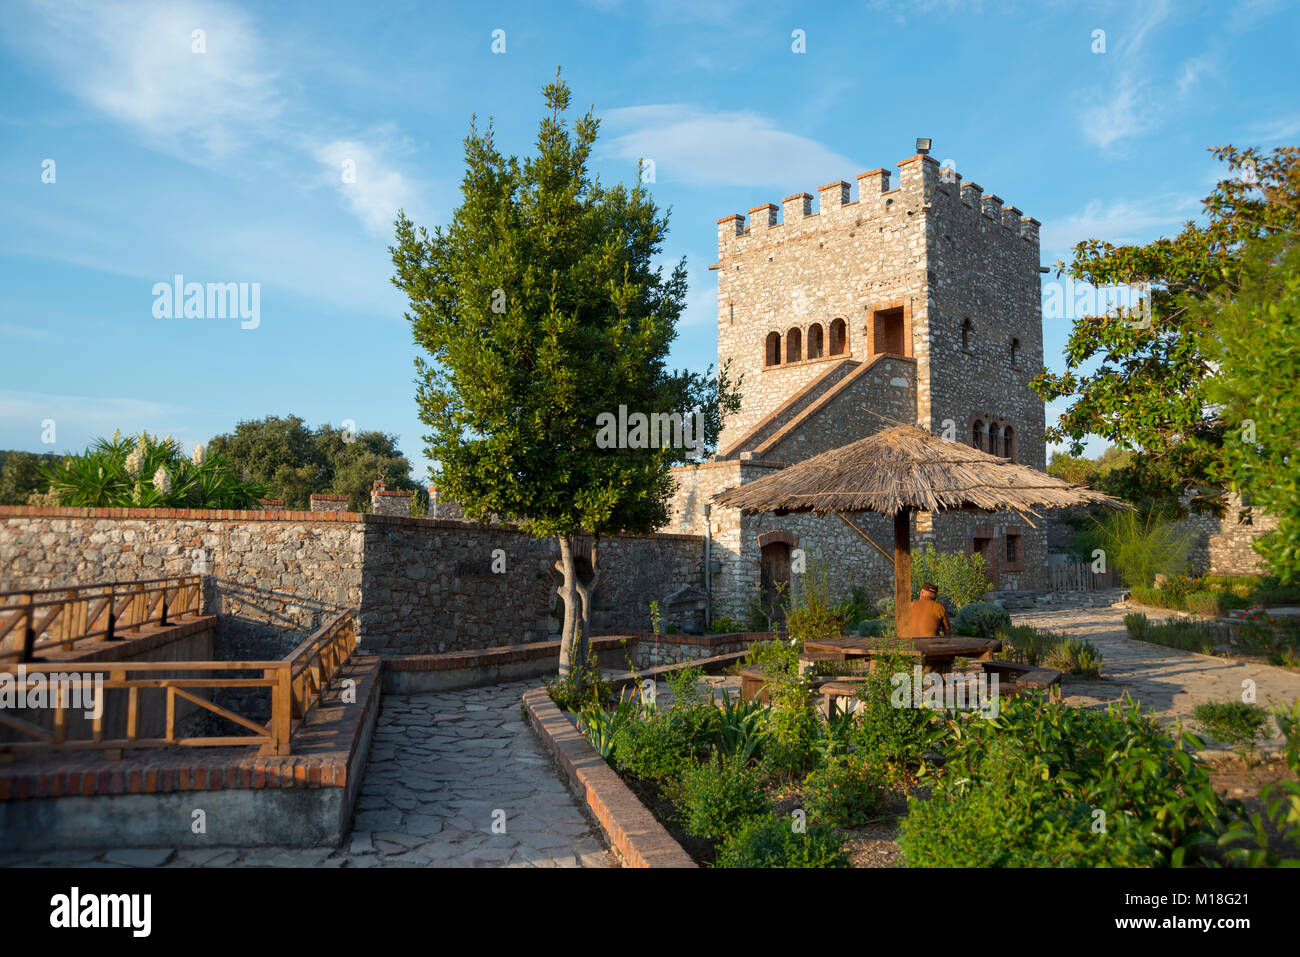 Venetian castle,ruined city,National Park Butrint,Saranda,Albania - Stock Image